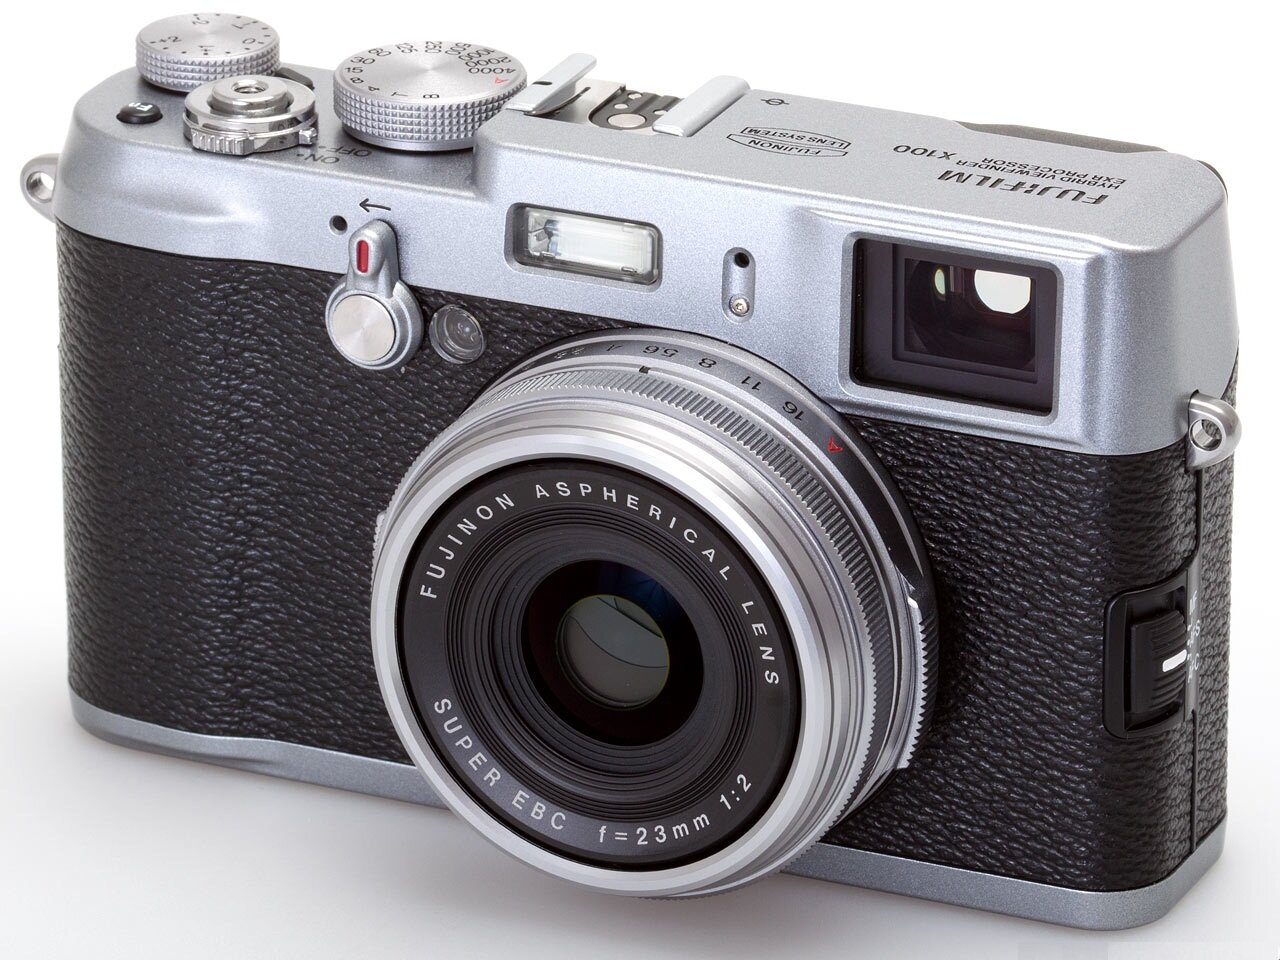 Máy ảnh DSLR Fujifilm X100 - 4896 x 3264 pixels